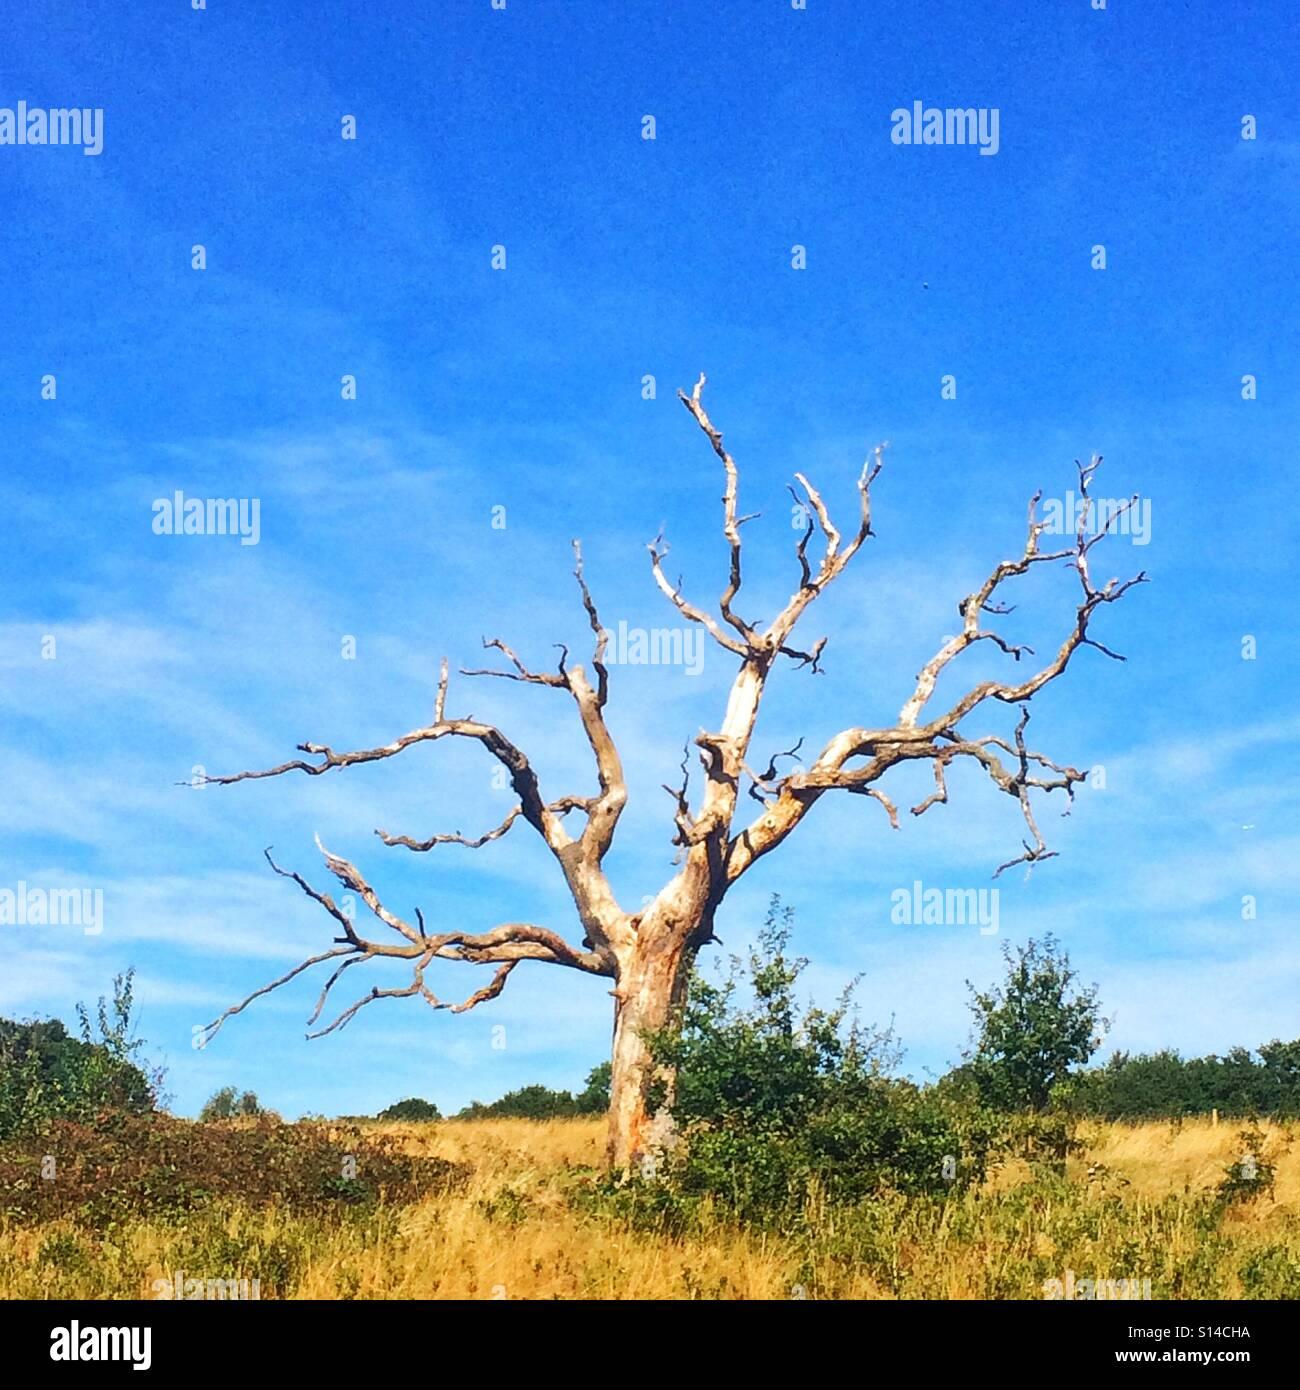 A solitary tree on Hampstead Heath, London - Stock Image